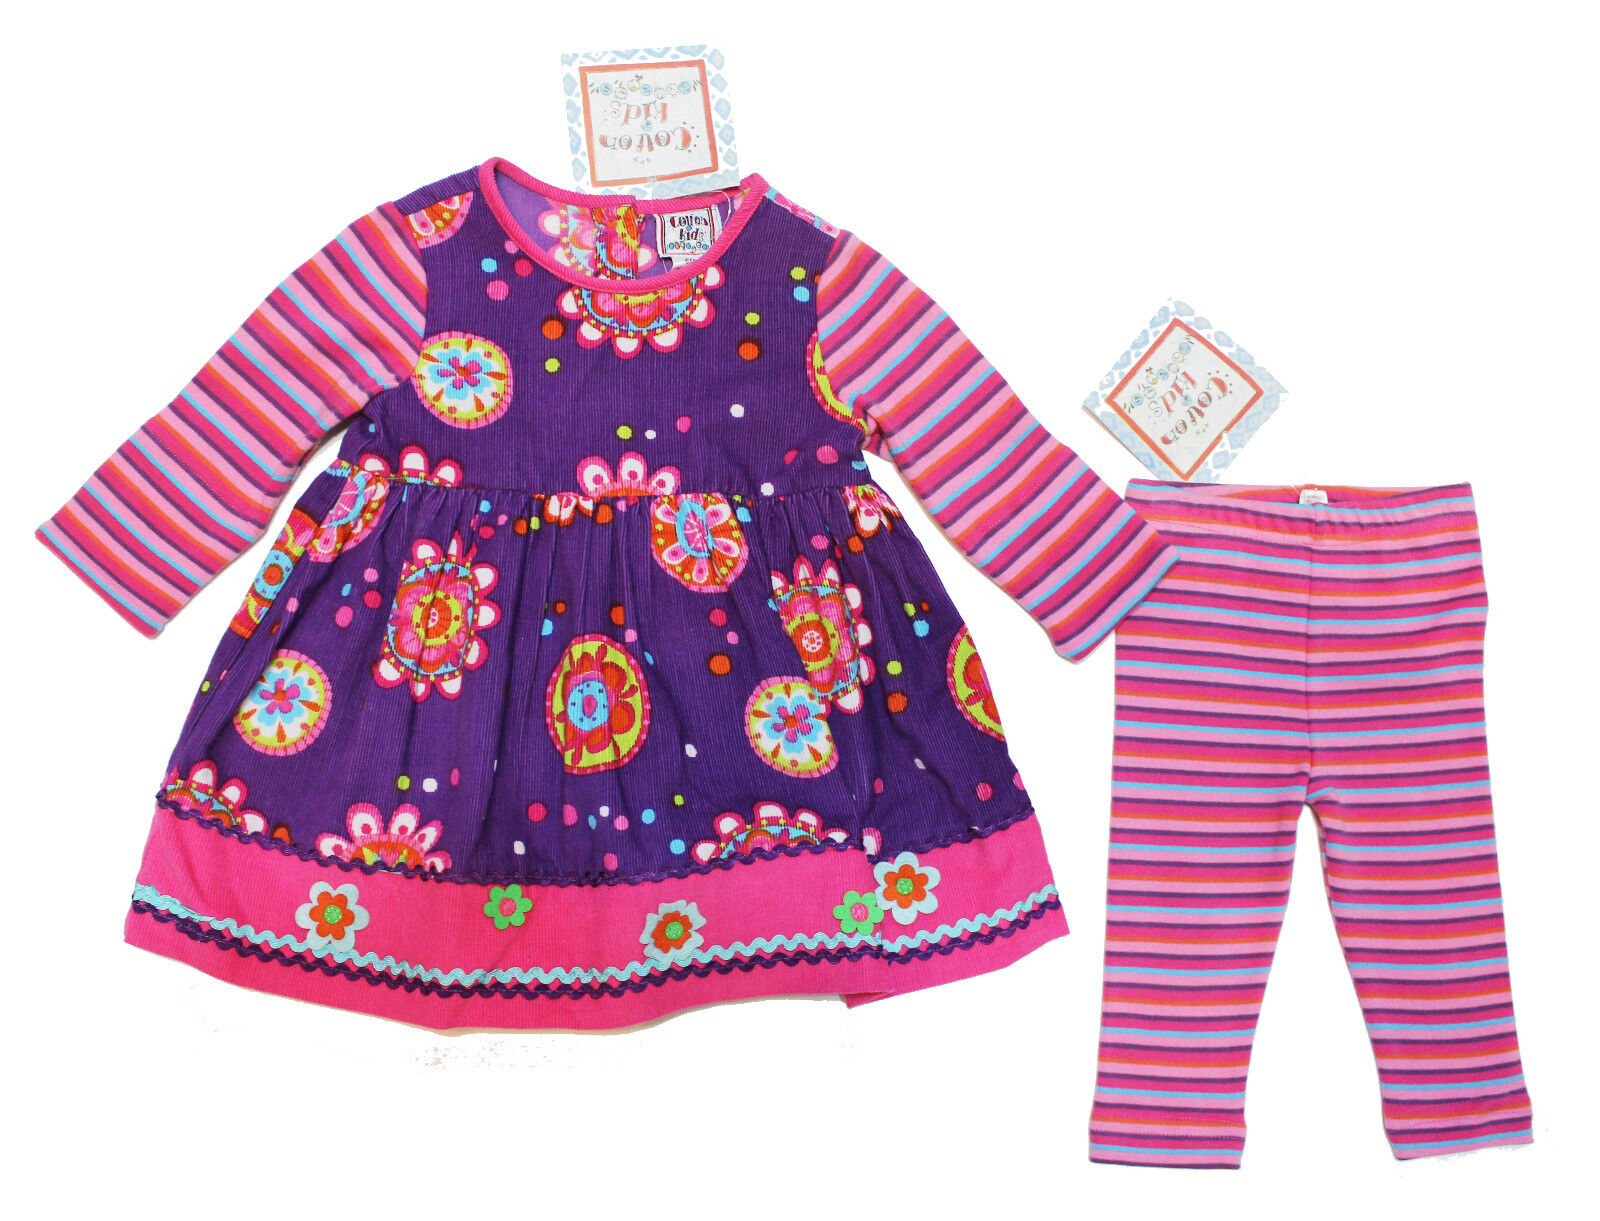 NWT Cotton Kids Baby Girl Flower Corduroy Dress and Legging Set